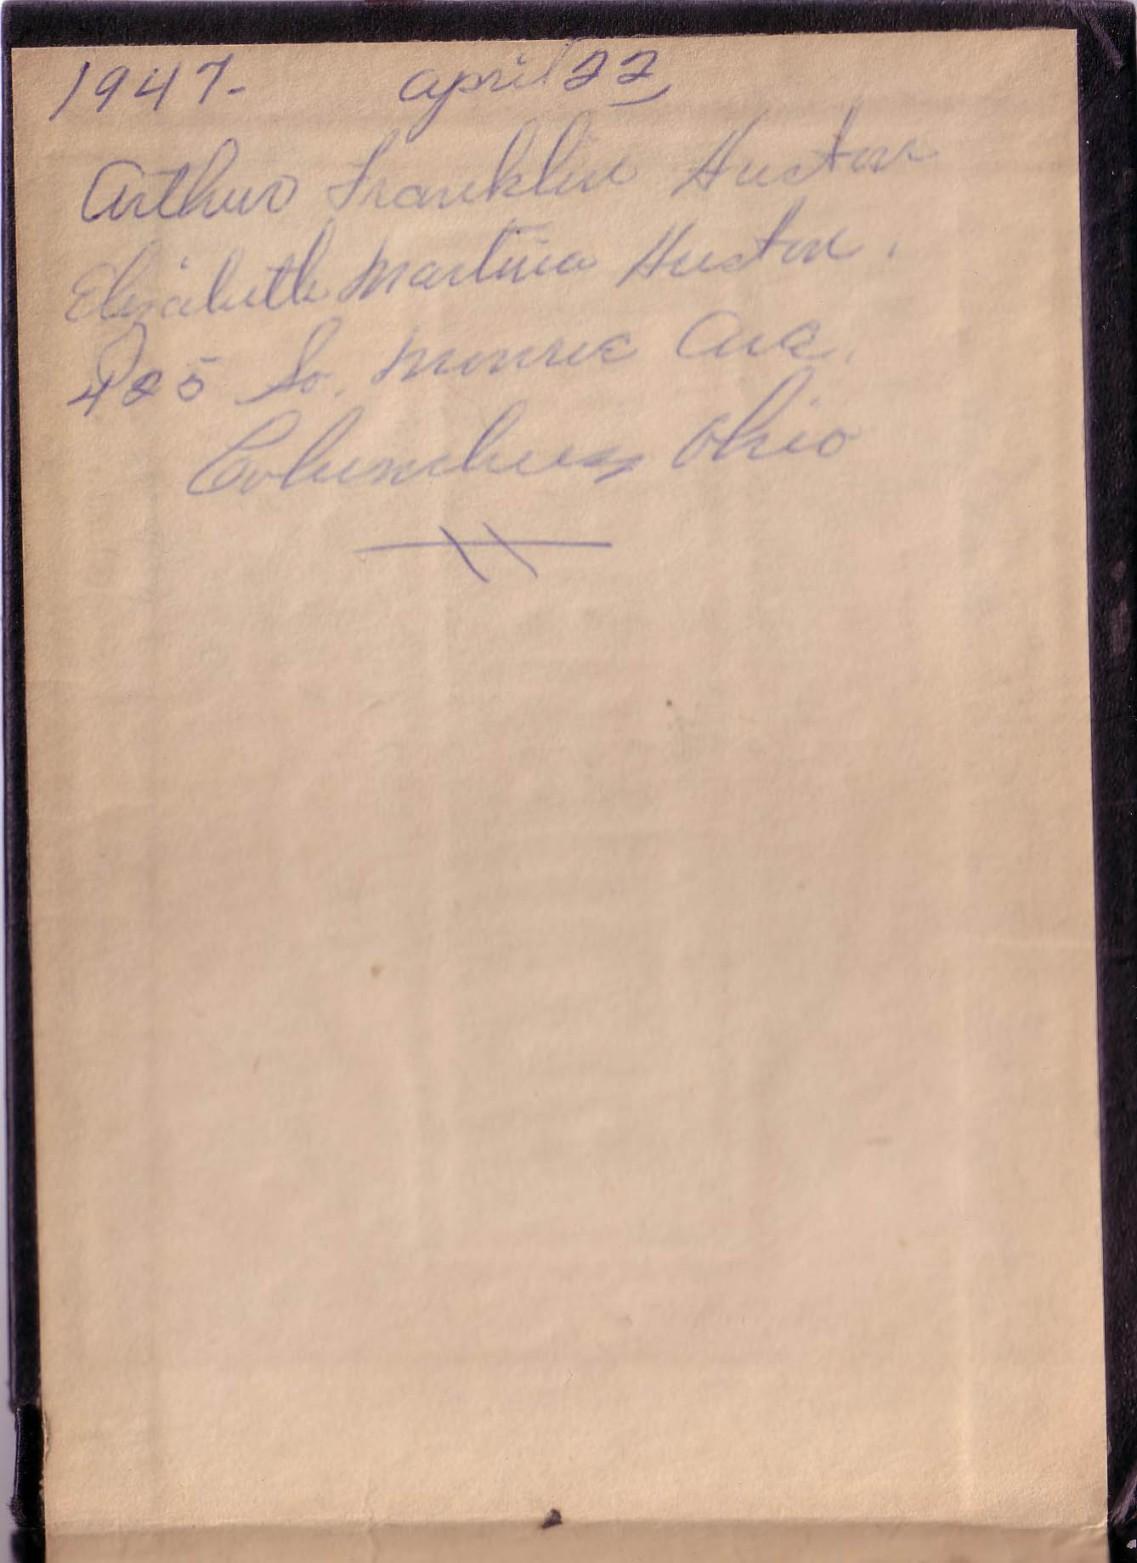 Arthur and Elizabeth Huston Vacation Album, ca. 1947 InsideCover